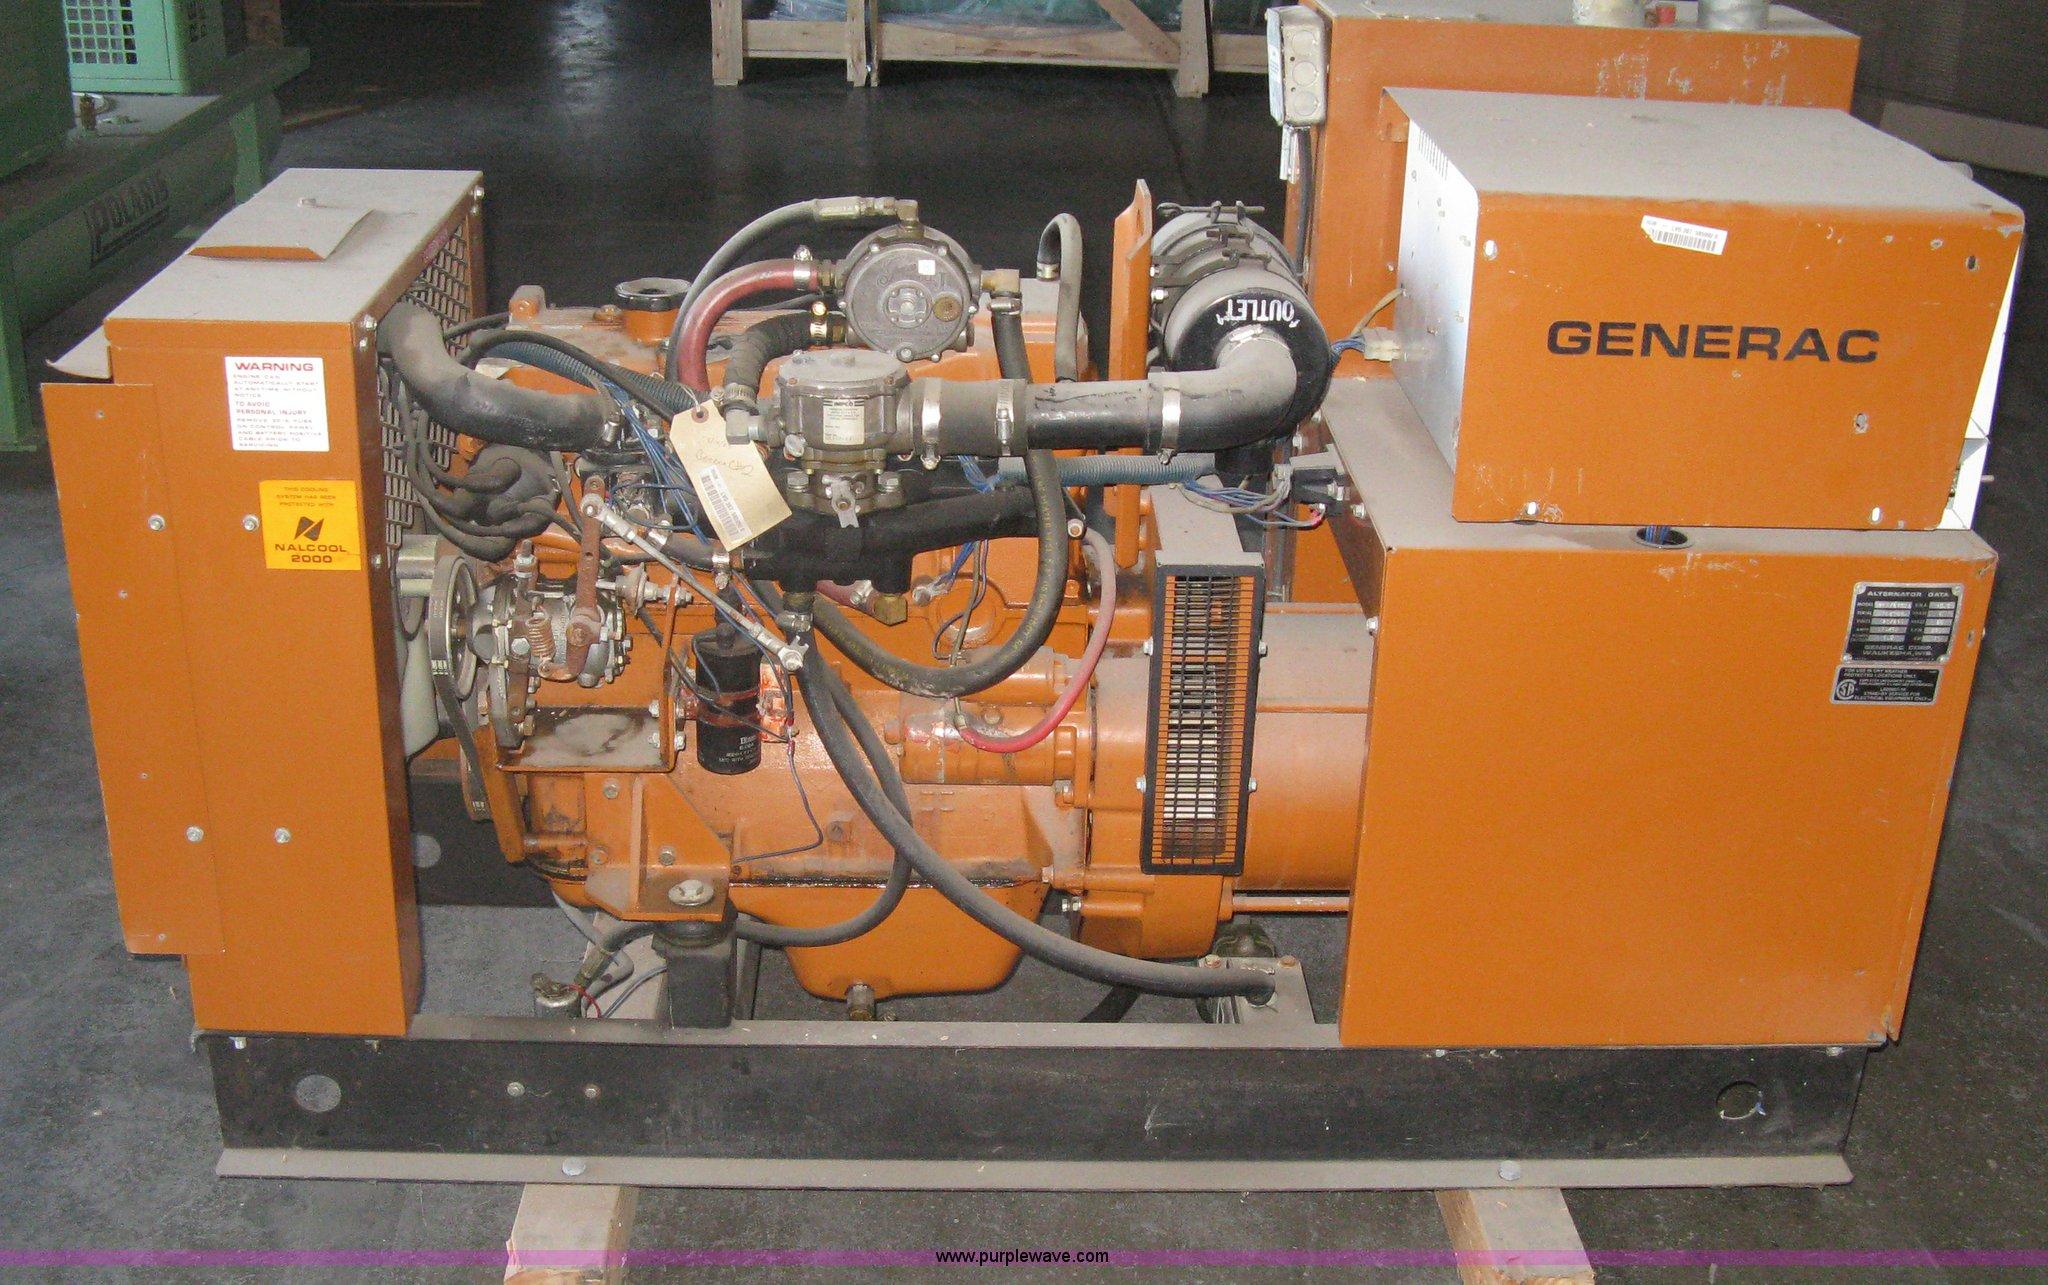 Generac gas powered generator Item G9756